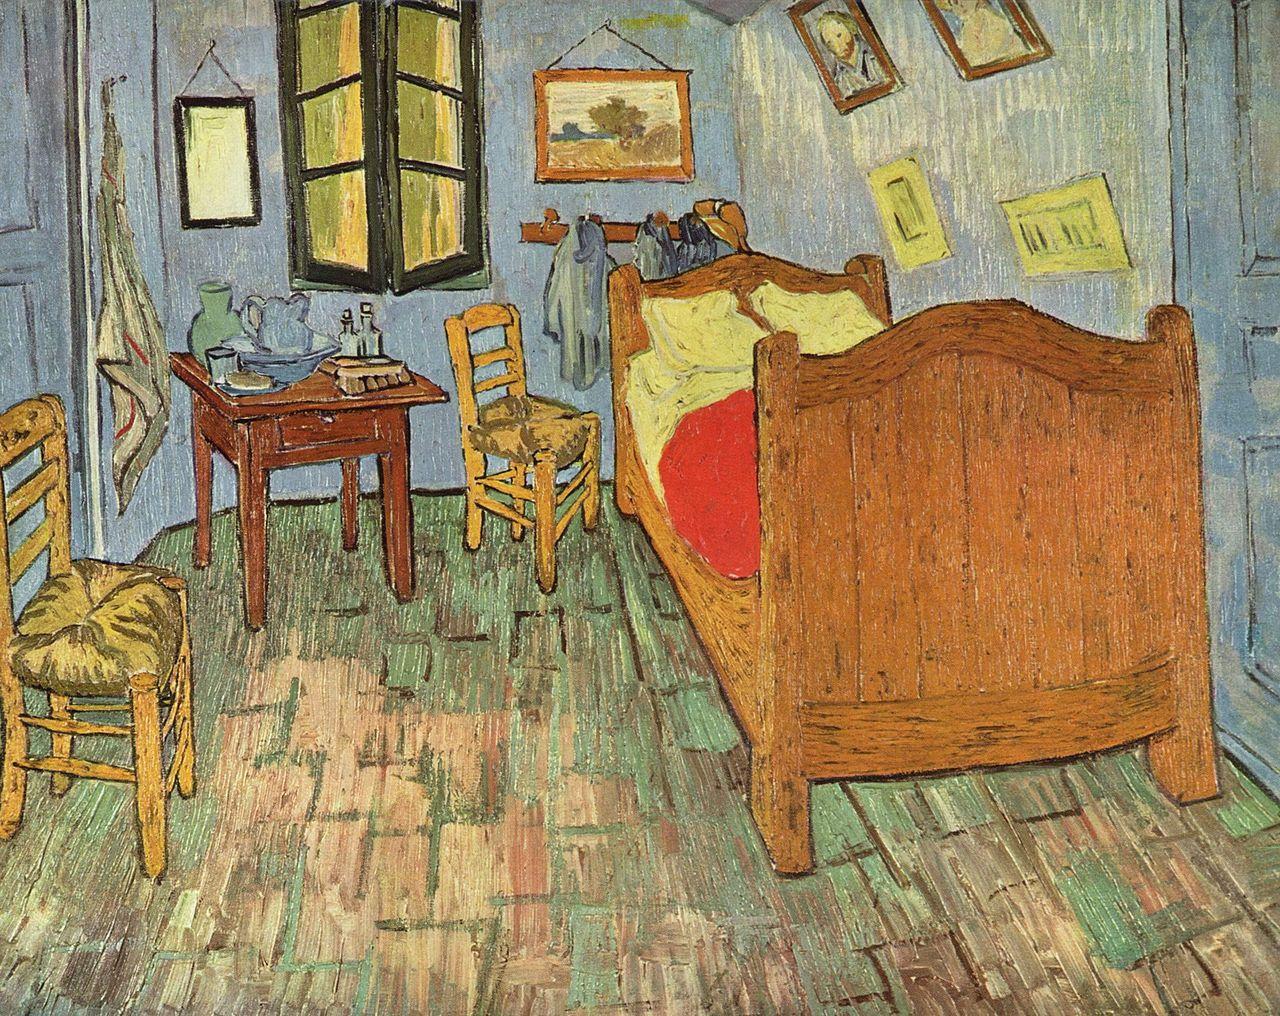 Datei:Vincent Willem van Gogh 135.jpg – Wikipedia